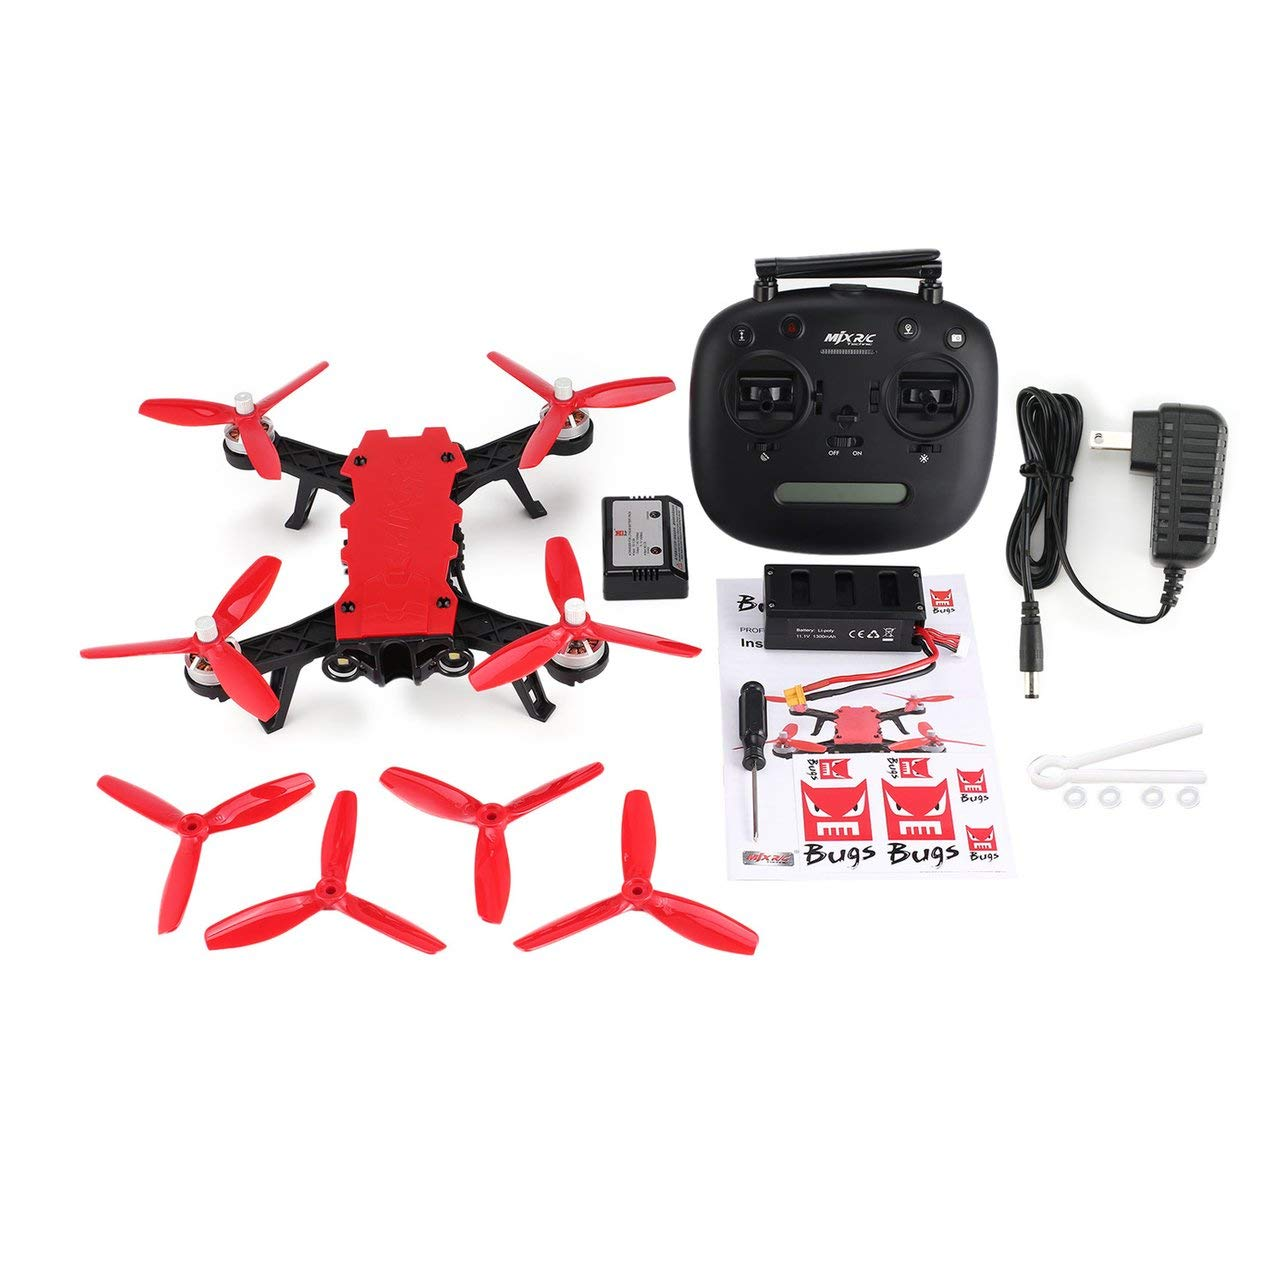 DeeploveUU MJX Bugs 8 Pro B8pro 2.4GHz 65km / h高速ブラシレスモーターRCレーシングドローンQuadcopter with 3Dフリップアングル/ Acroモード B07S2RBQM2